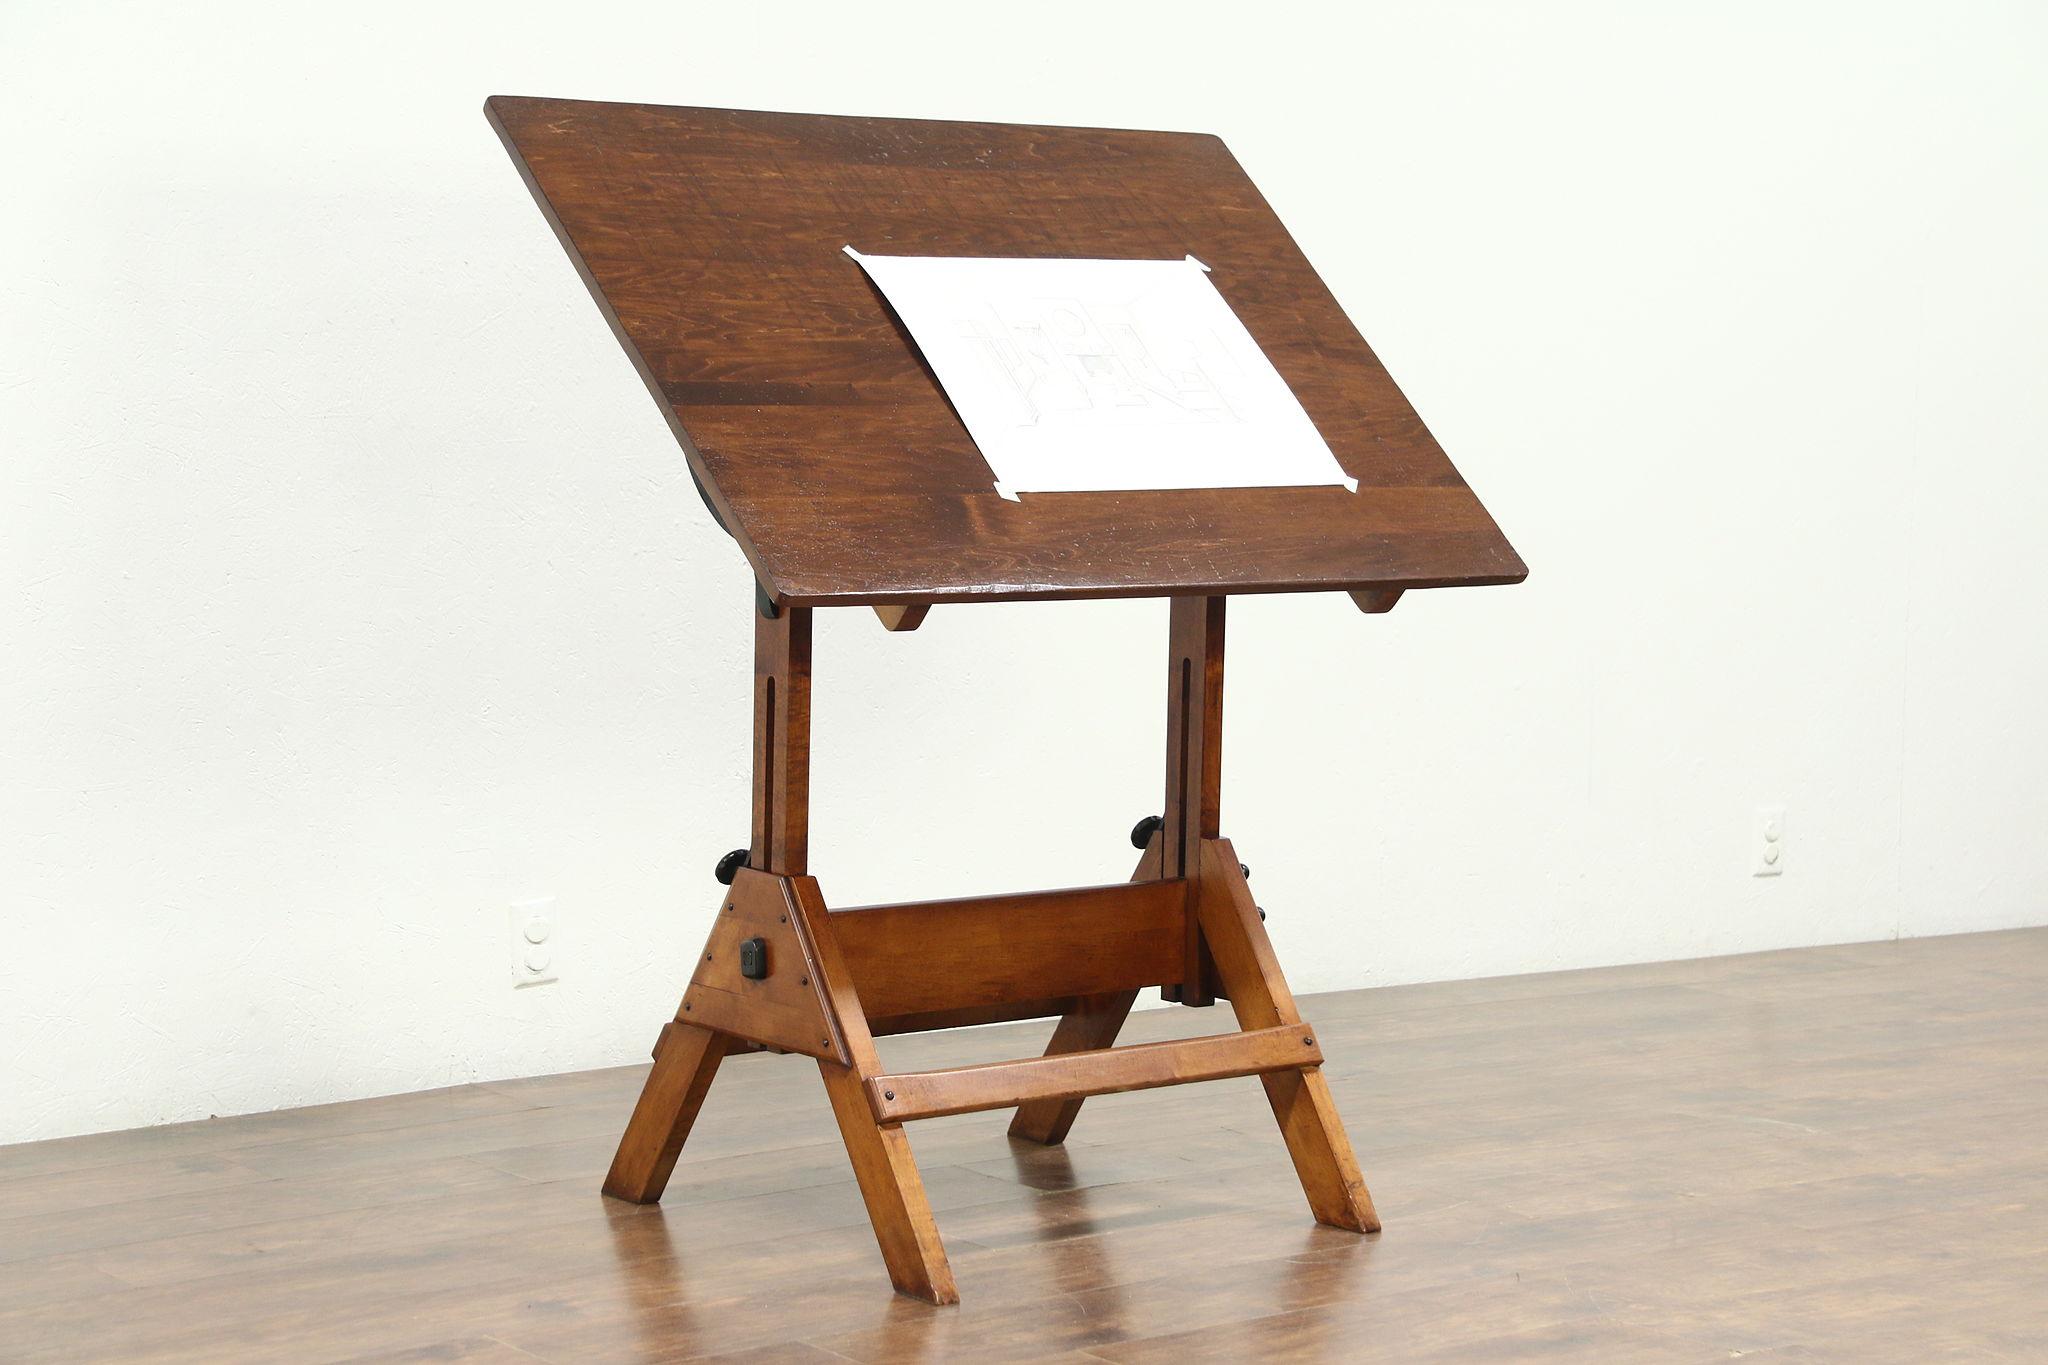 Astonishing Drafting Table Or Adjustable Vintage Artist Desk Kitchen Island Wine Table Download Free Architecture Designs Embacsunscenecom